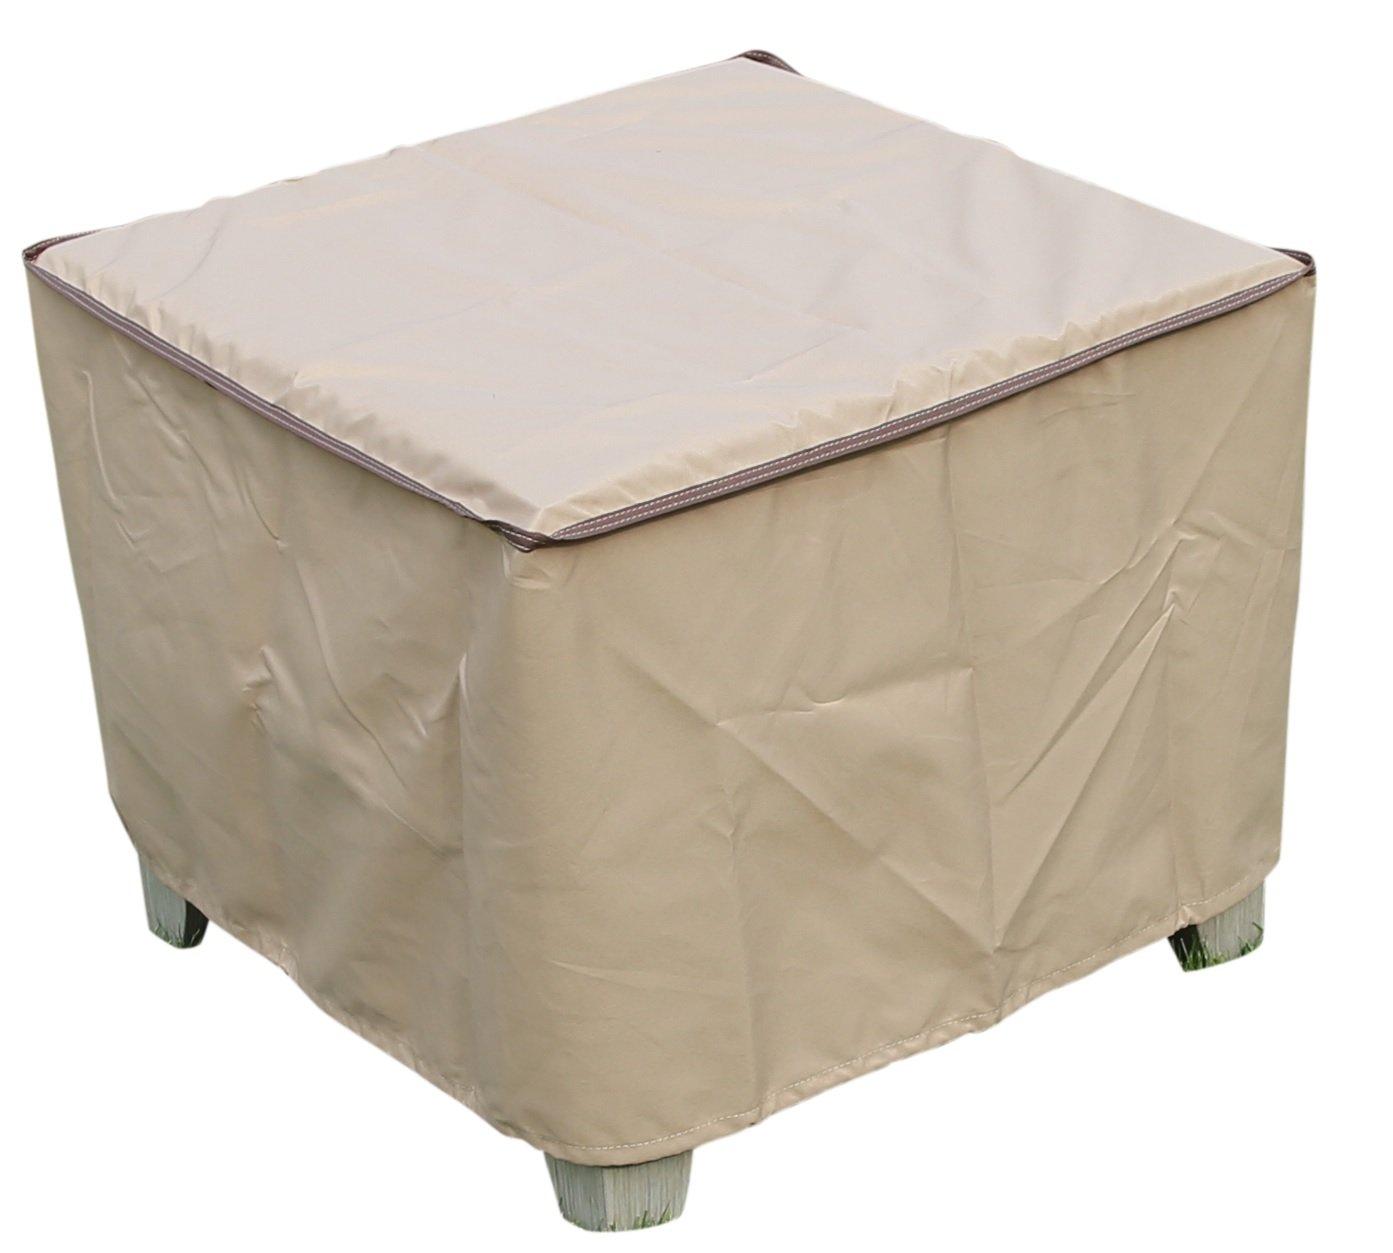 Amazon com sorara rectangular coffee side end table cover outdoor porch ottoman table cover water resistant 26 l x 26 w x 18 h garden outdoor